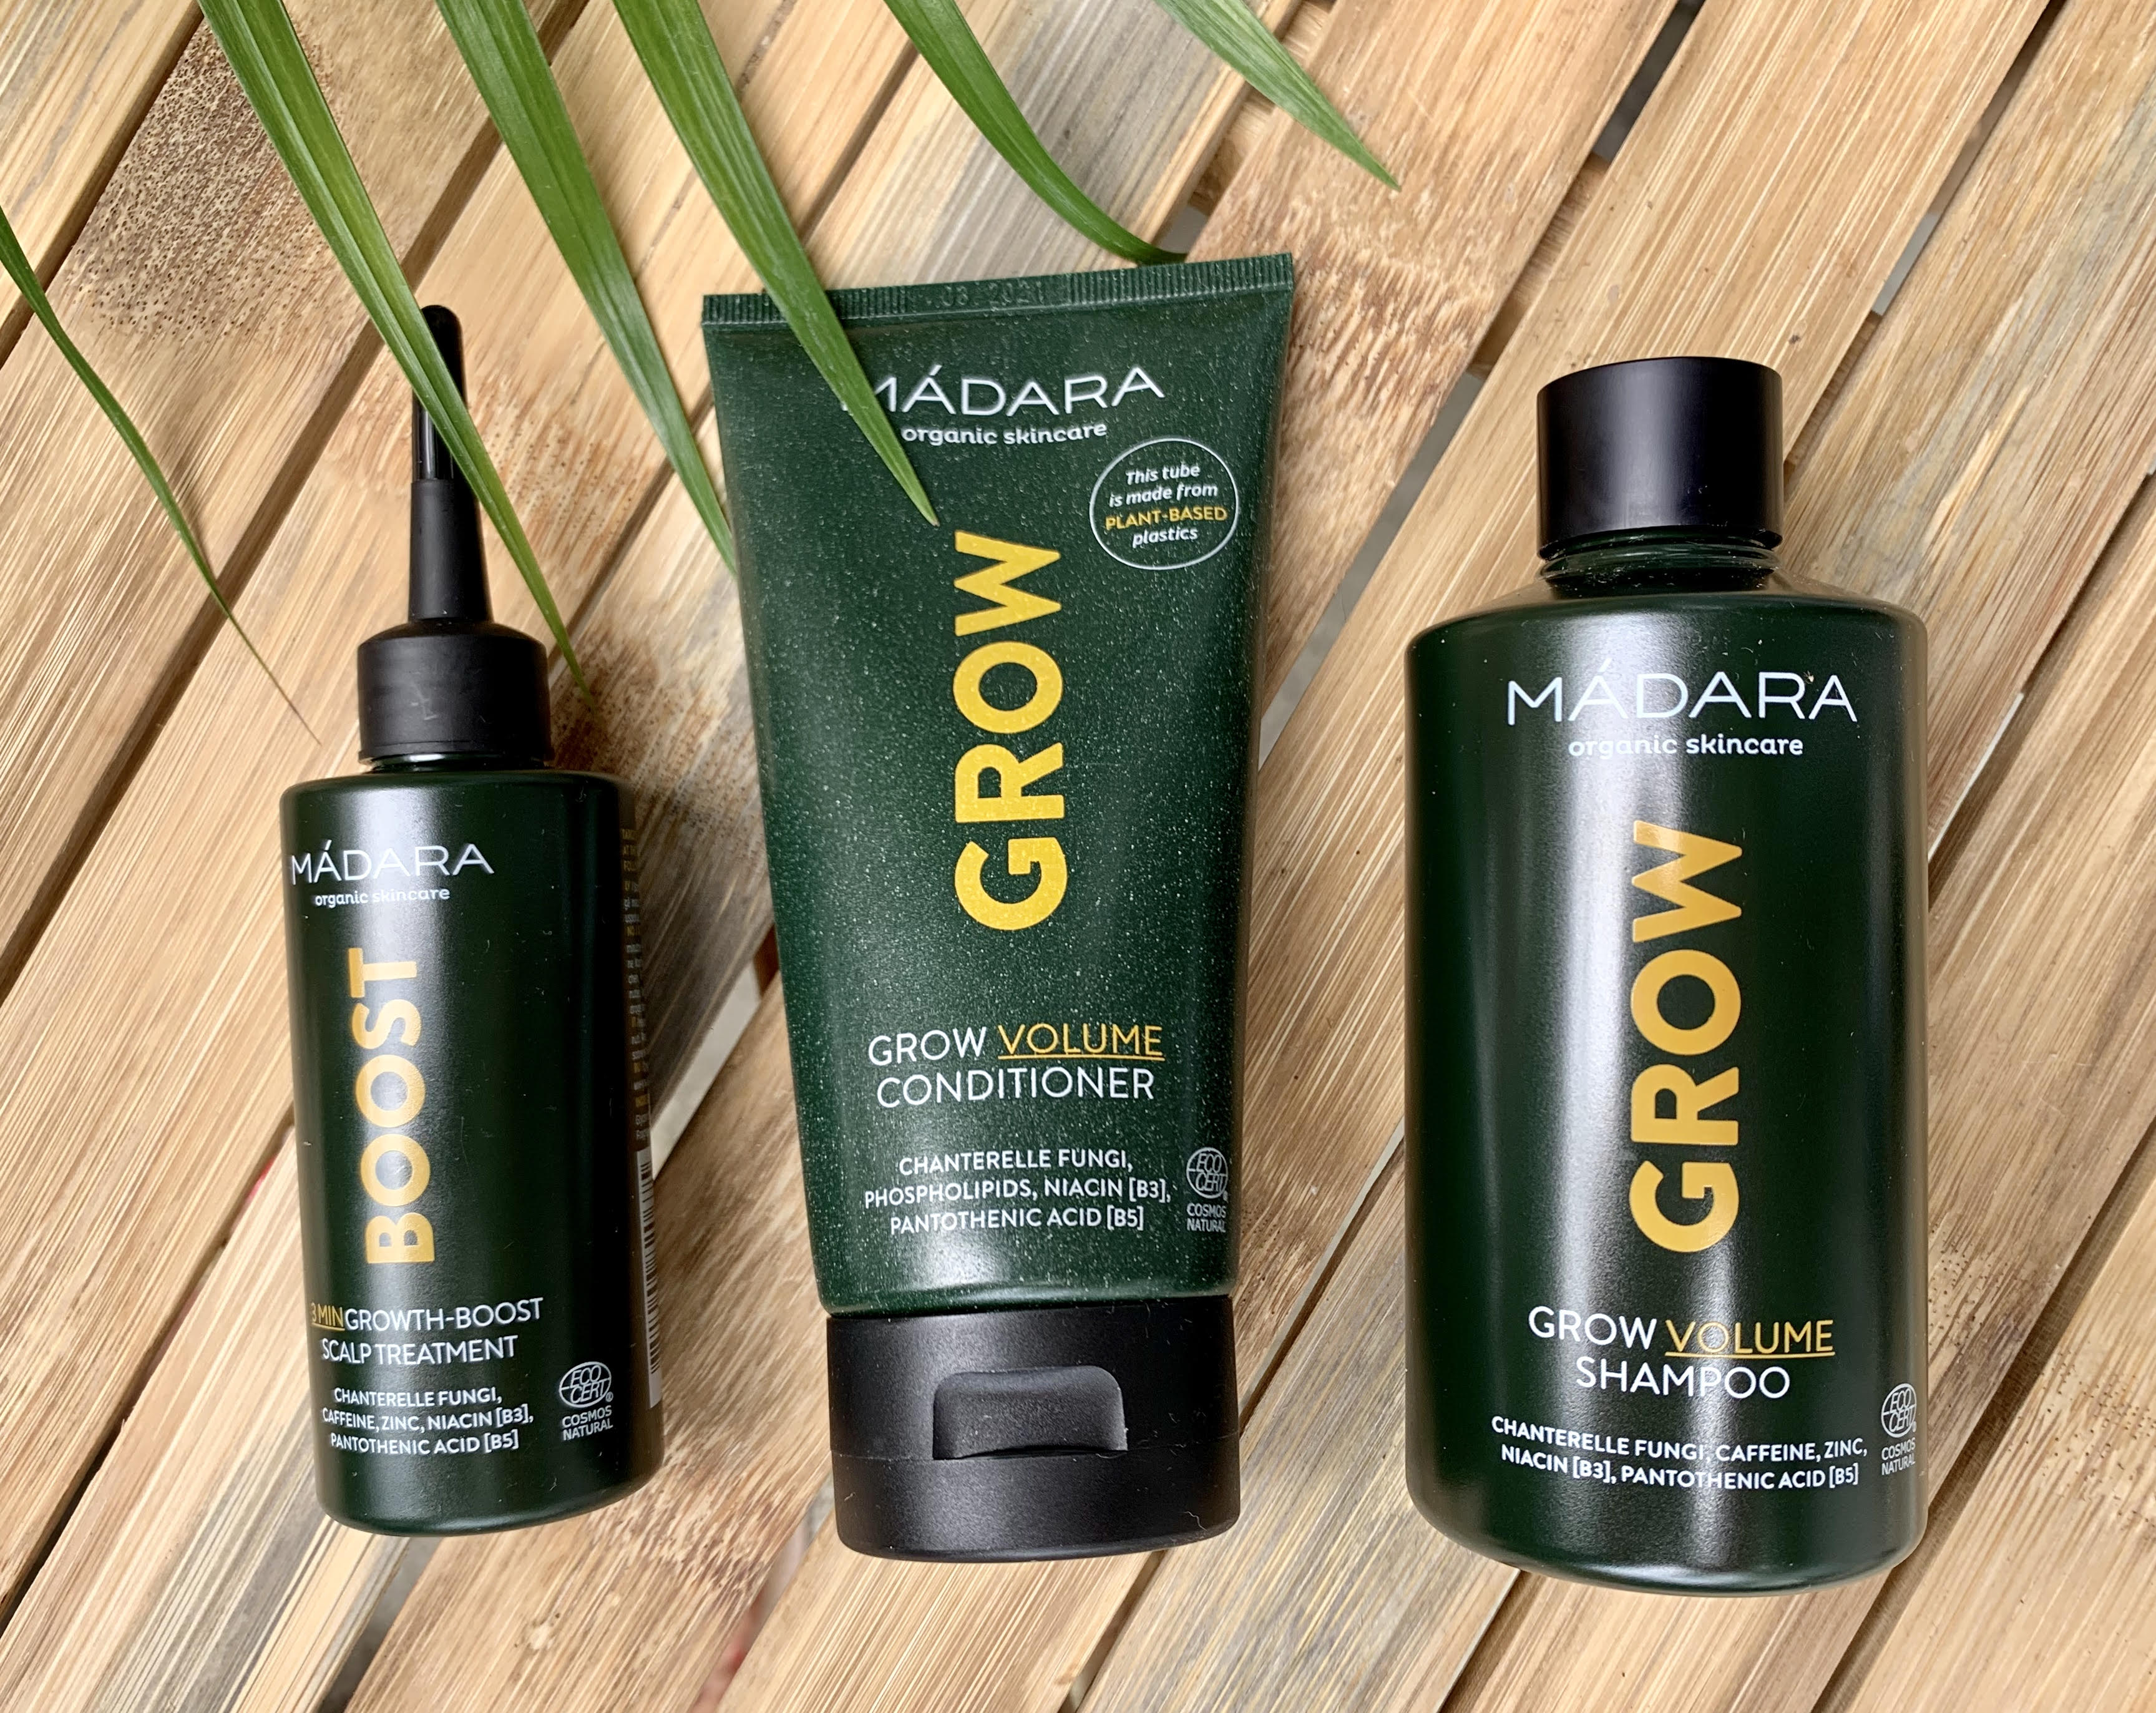 GROW, Madara, hårpleje, hårvækst, hårvitaminer, hår